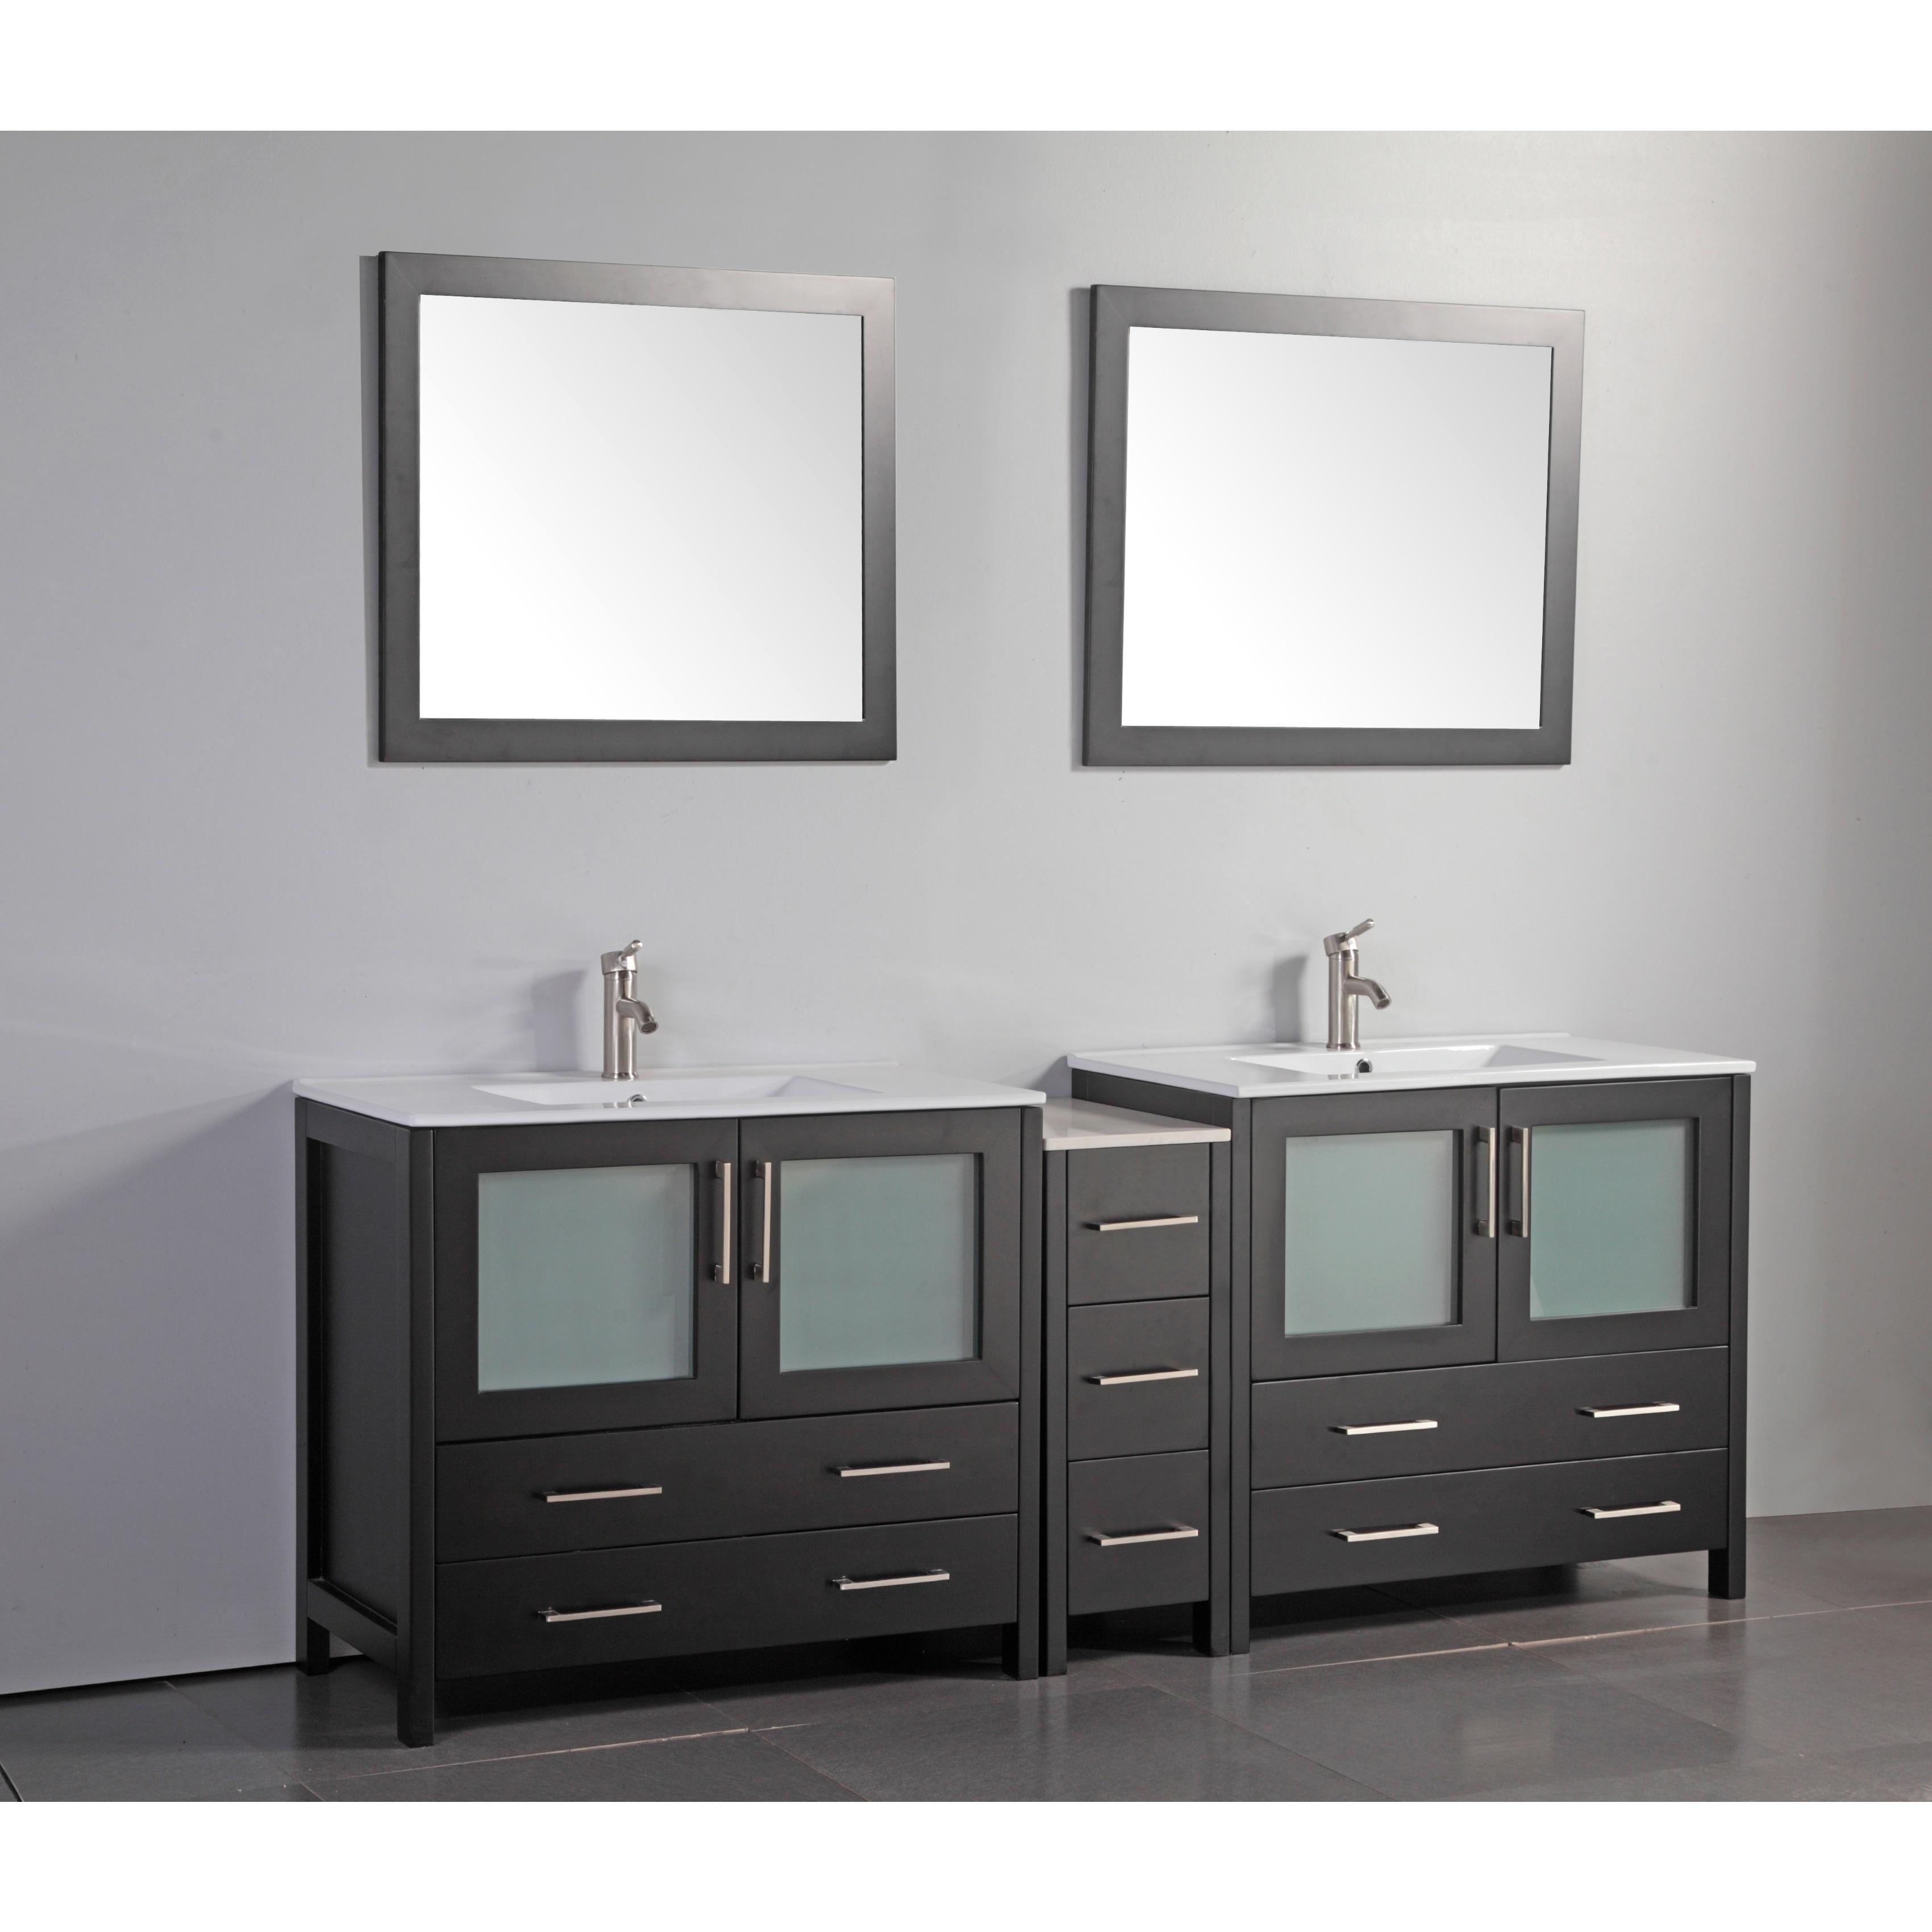 84 inch vanity top double sink. Vanity Art 84 inch Double sink Bathroom Set with C  vanity top double Compare Prices at Nextag